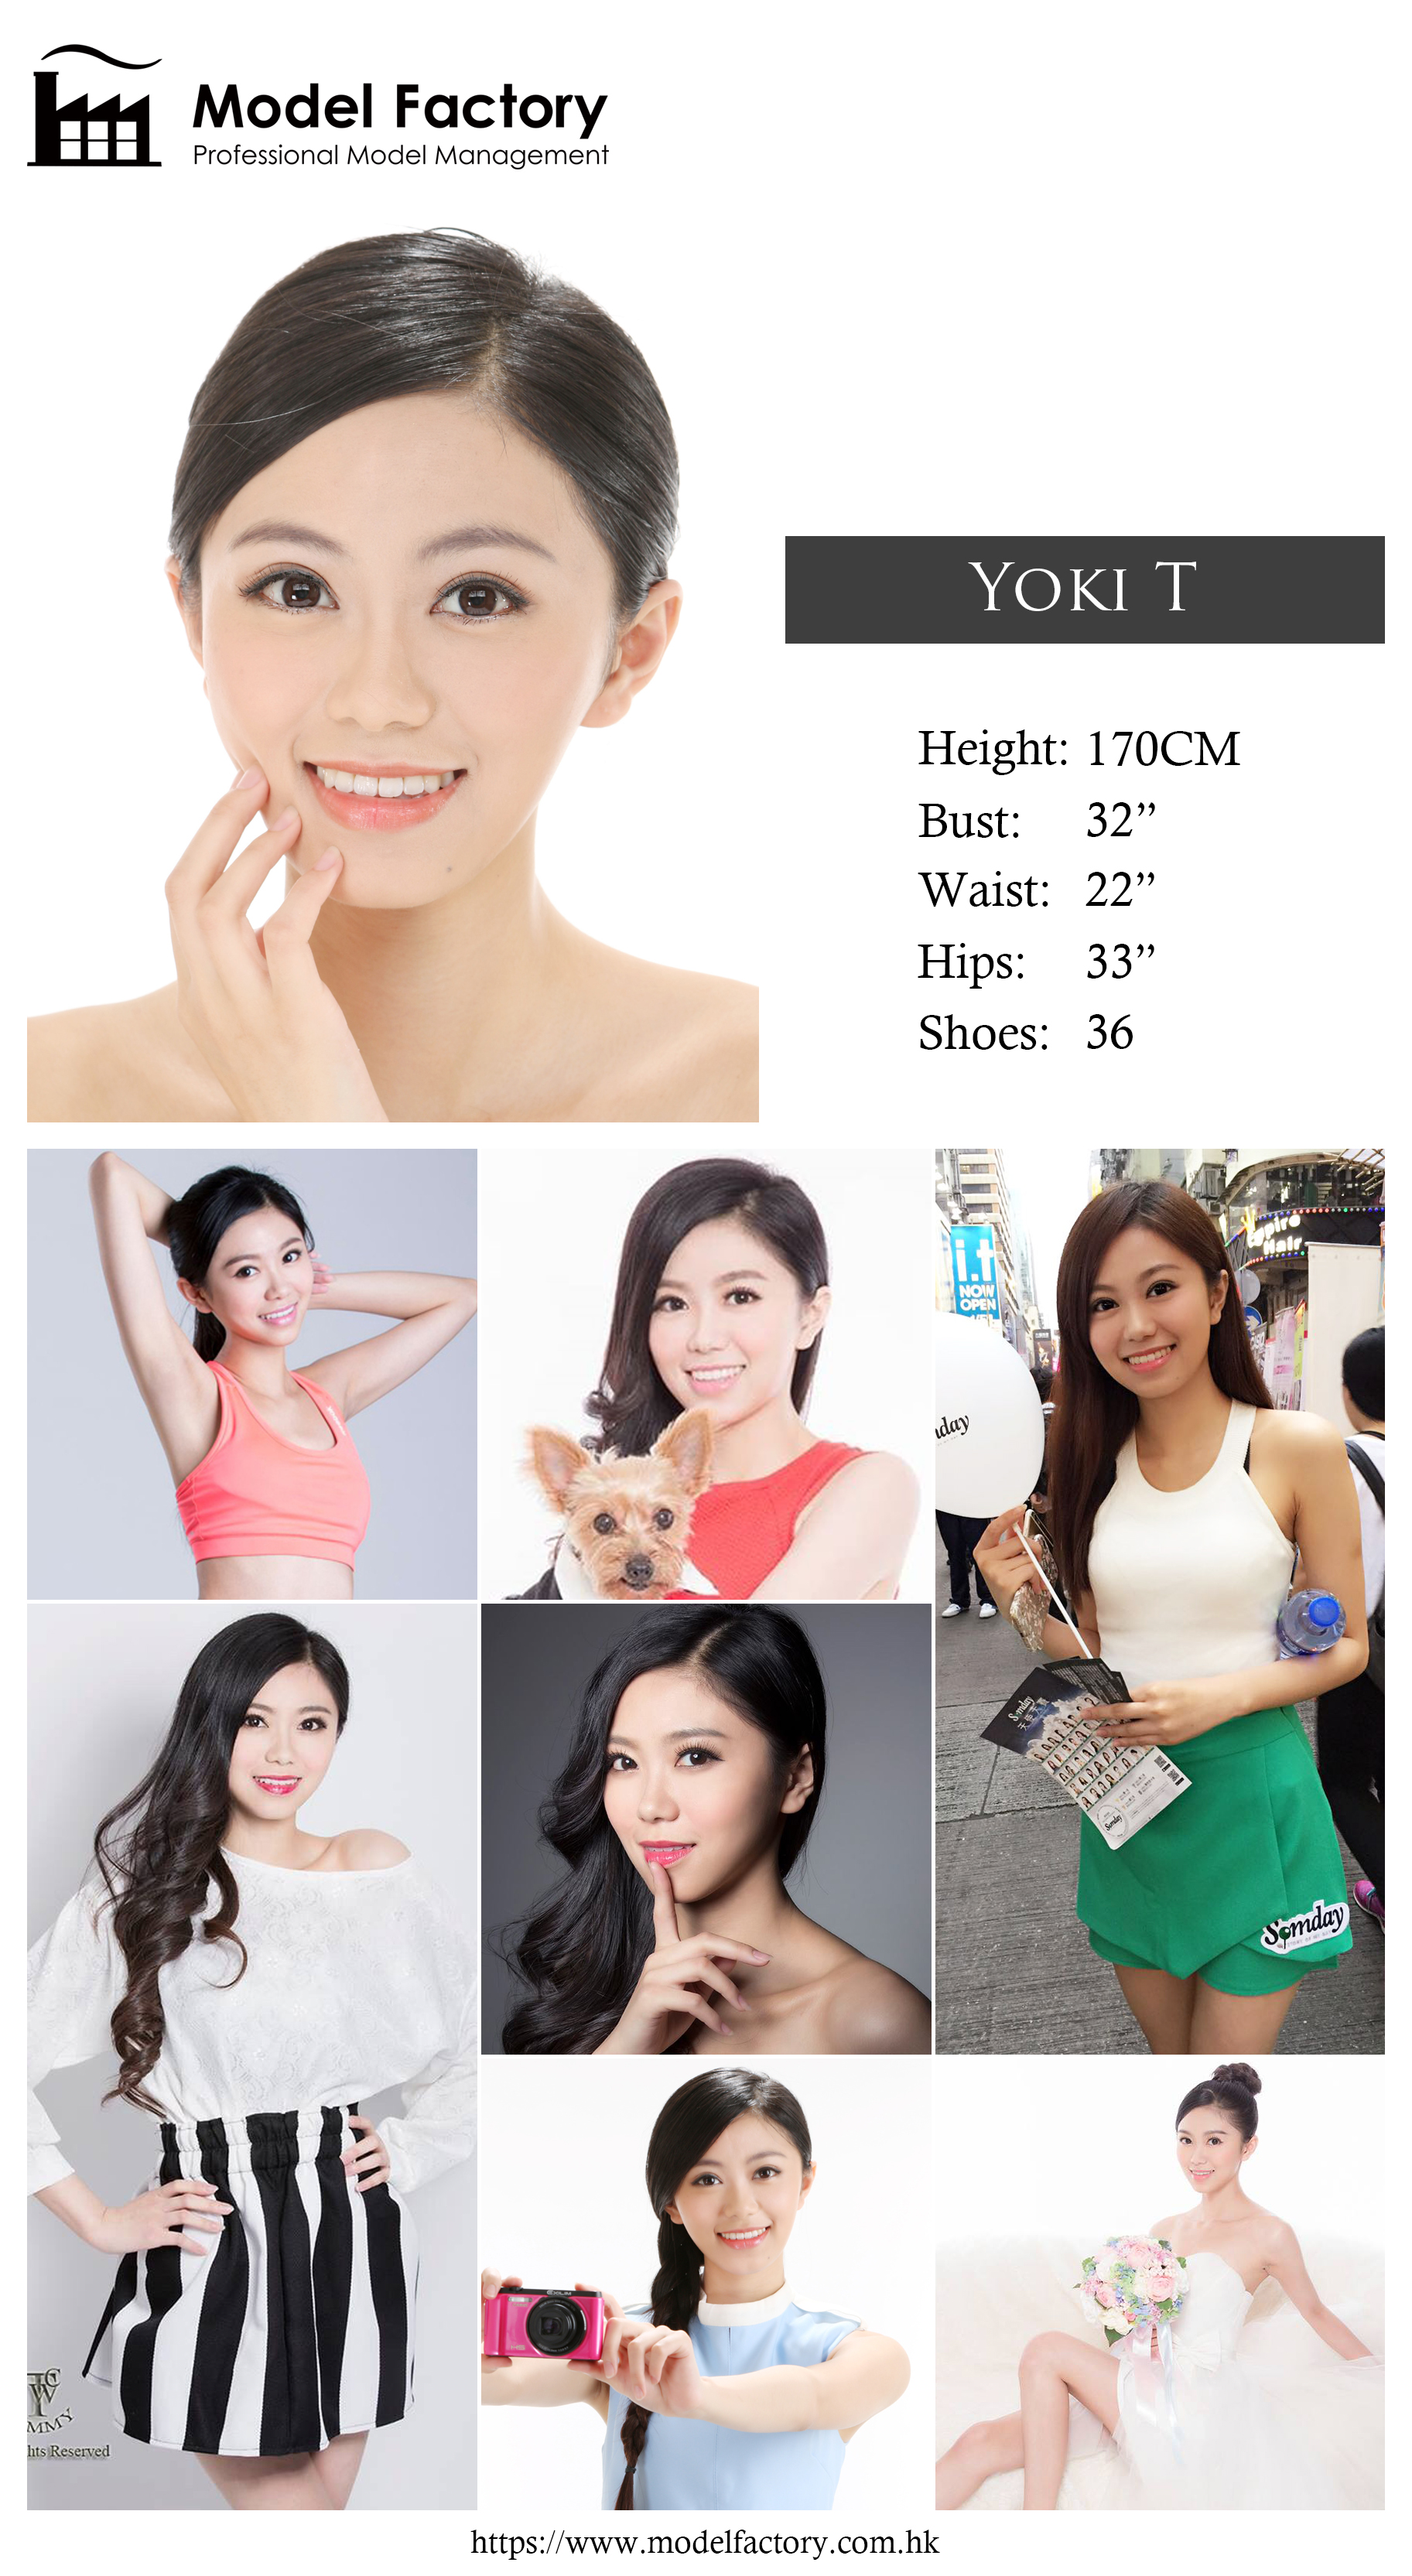 Model Factory Hong Kong Female Model YokiT